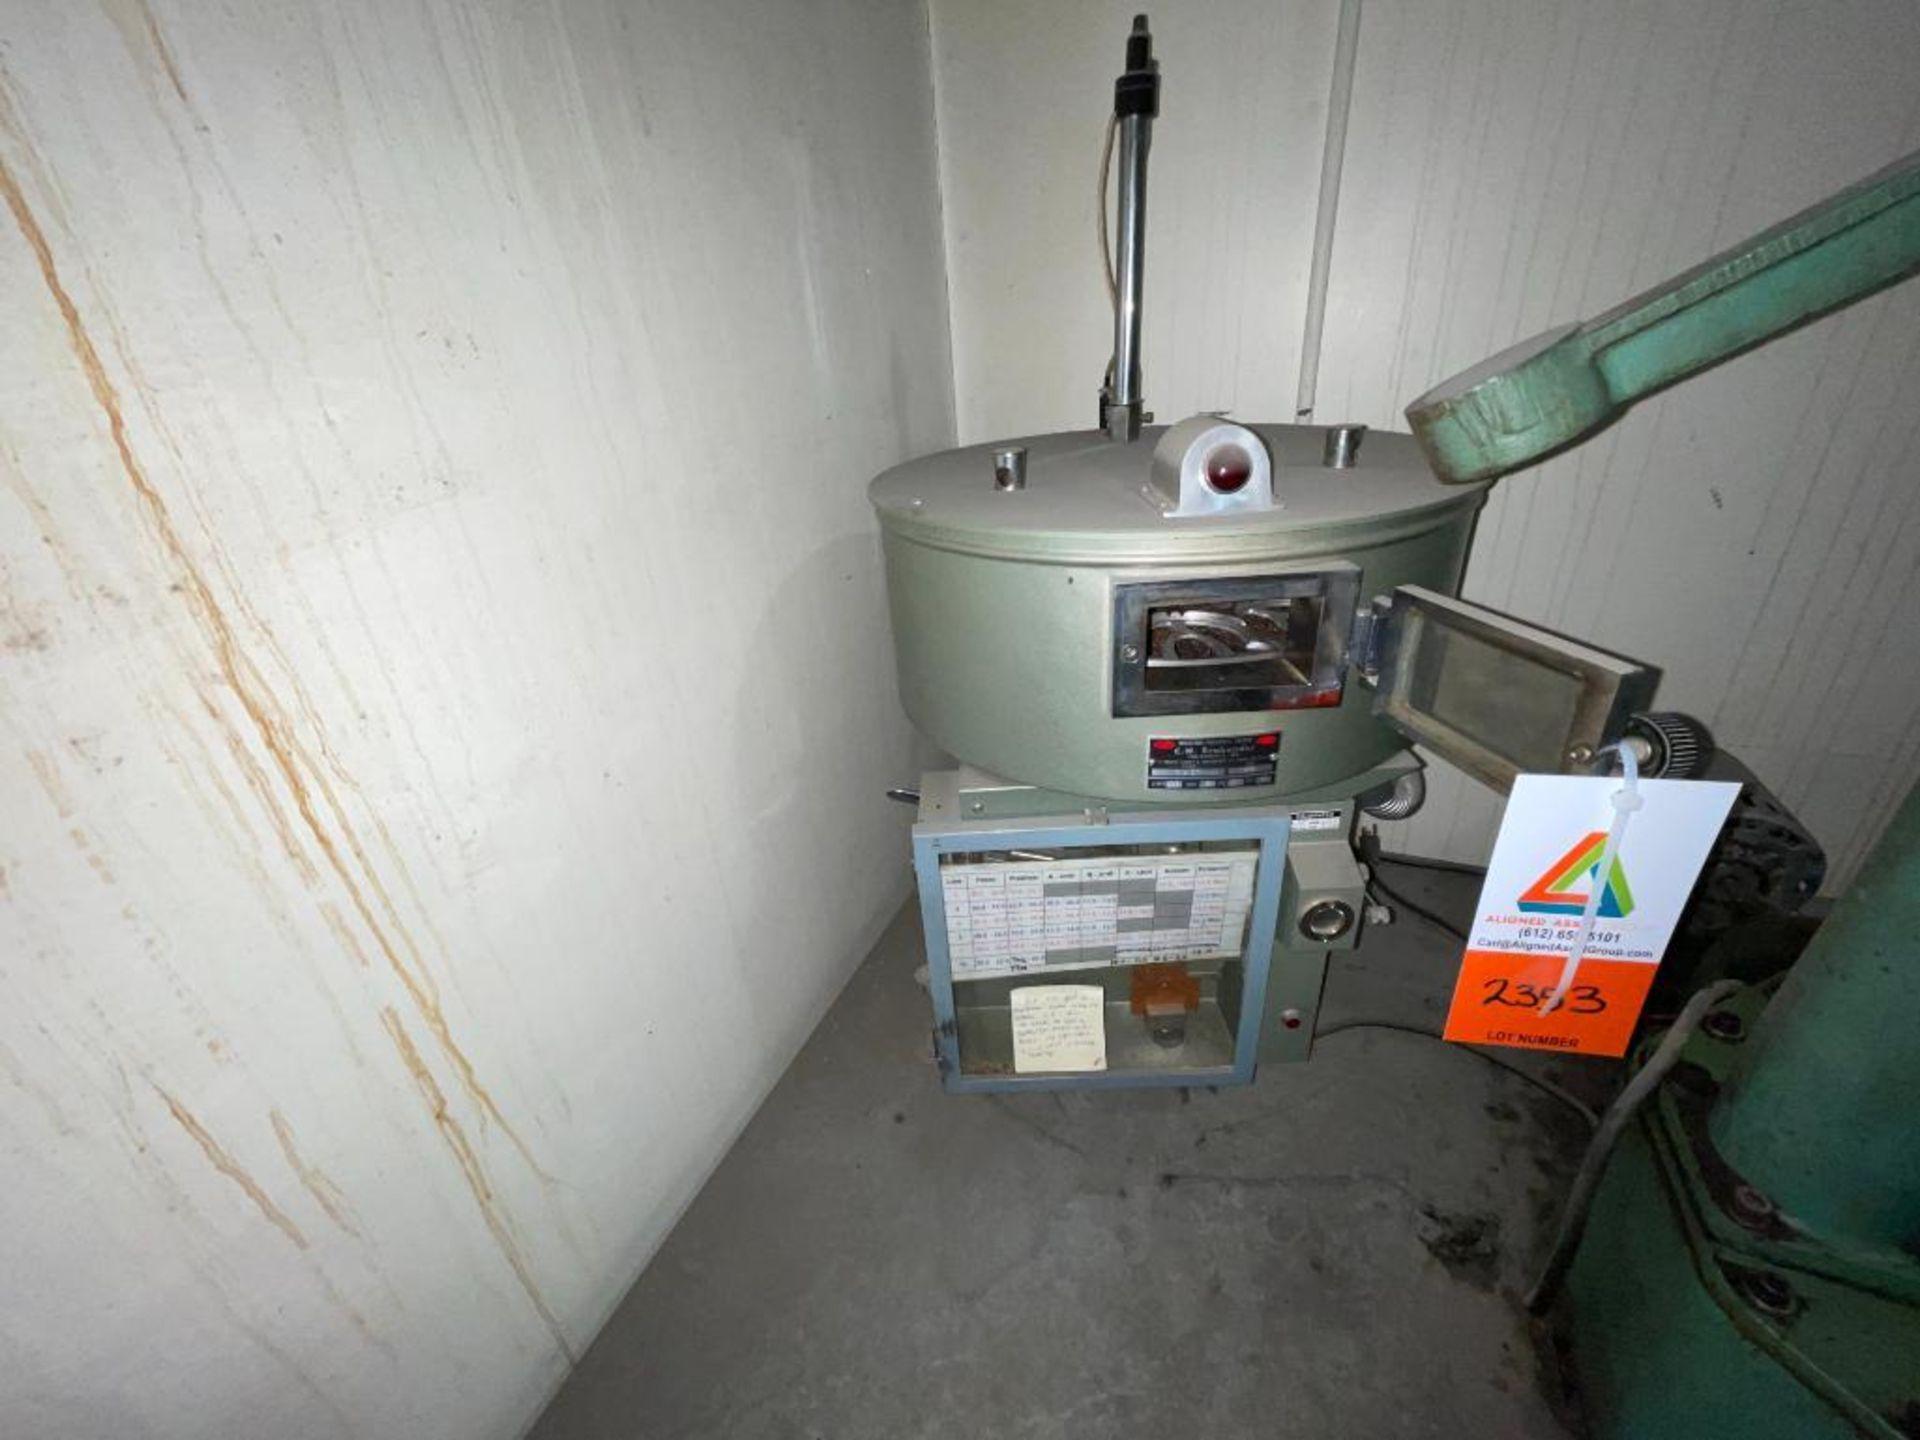 C.W. Brabender moisture tester